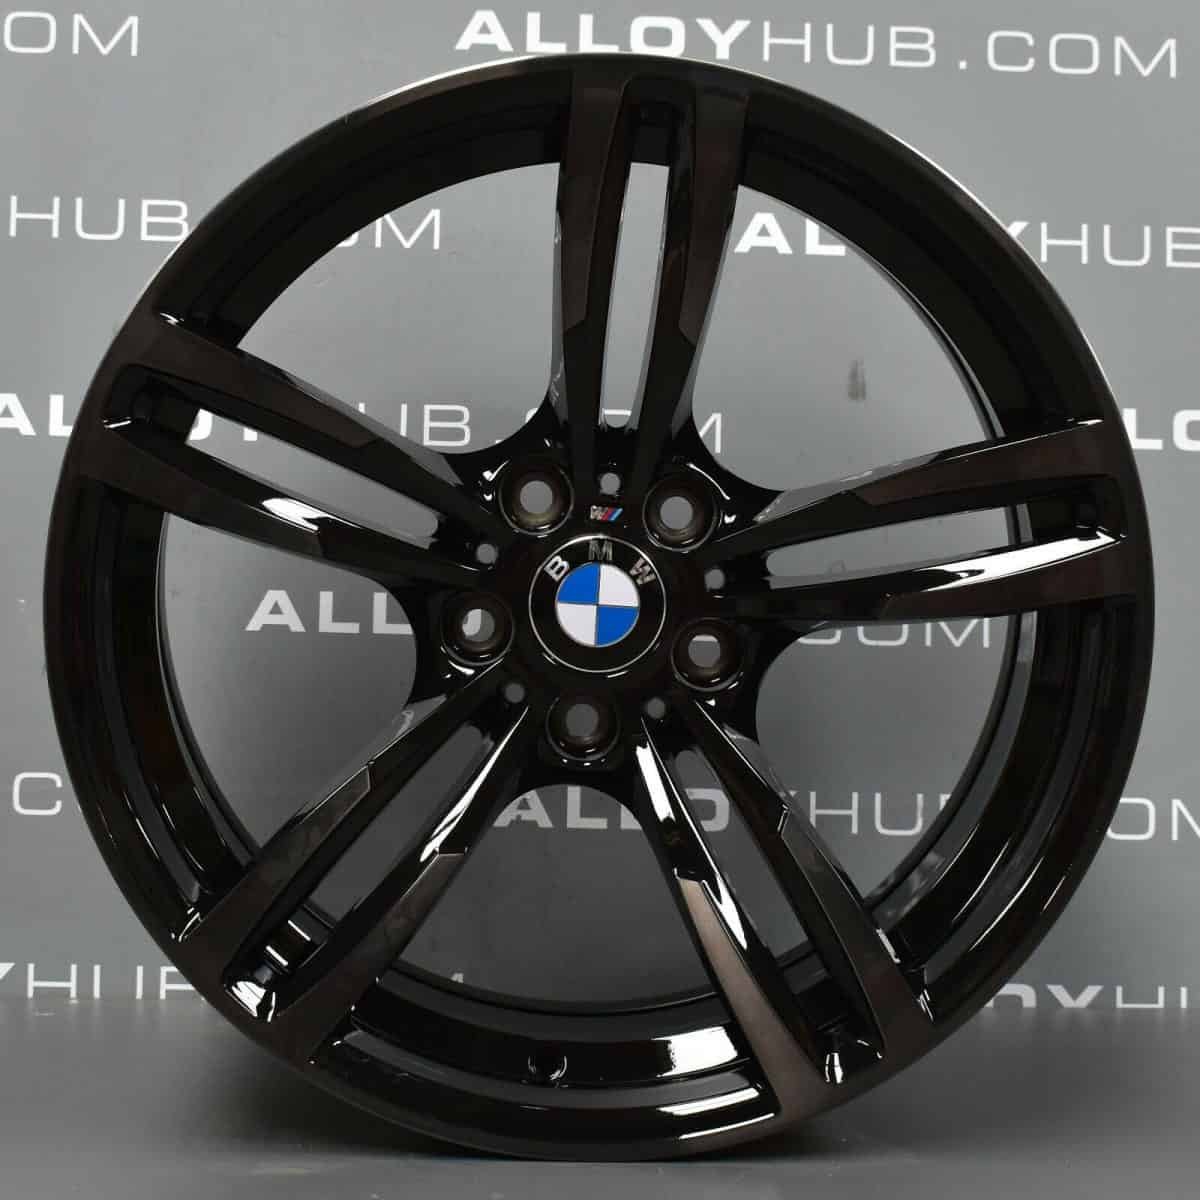 "Genuine BMW 437M Sport M2 M3 M4 F87 F80 F82 19"" Inch Alloy Wheels with Smoked Gloss Black Finish 36112284755 36112284756"